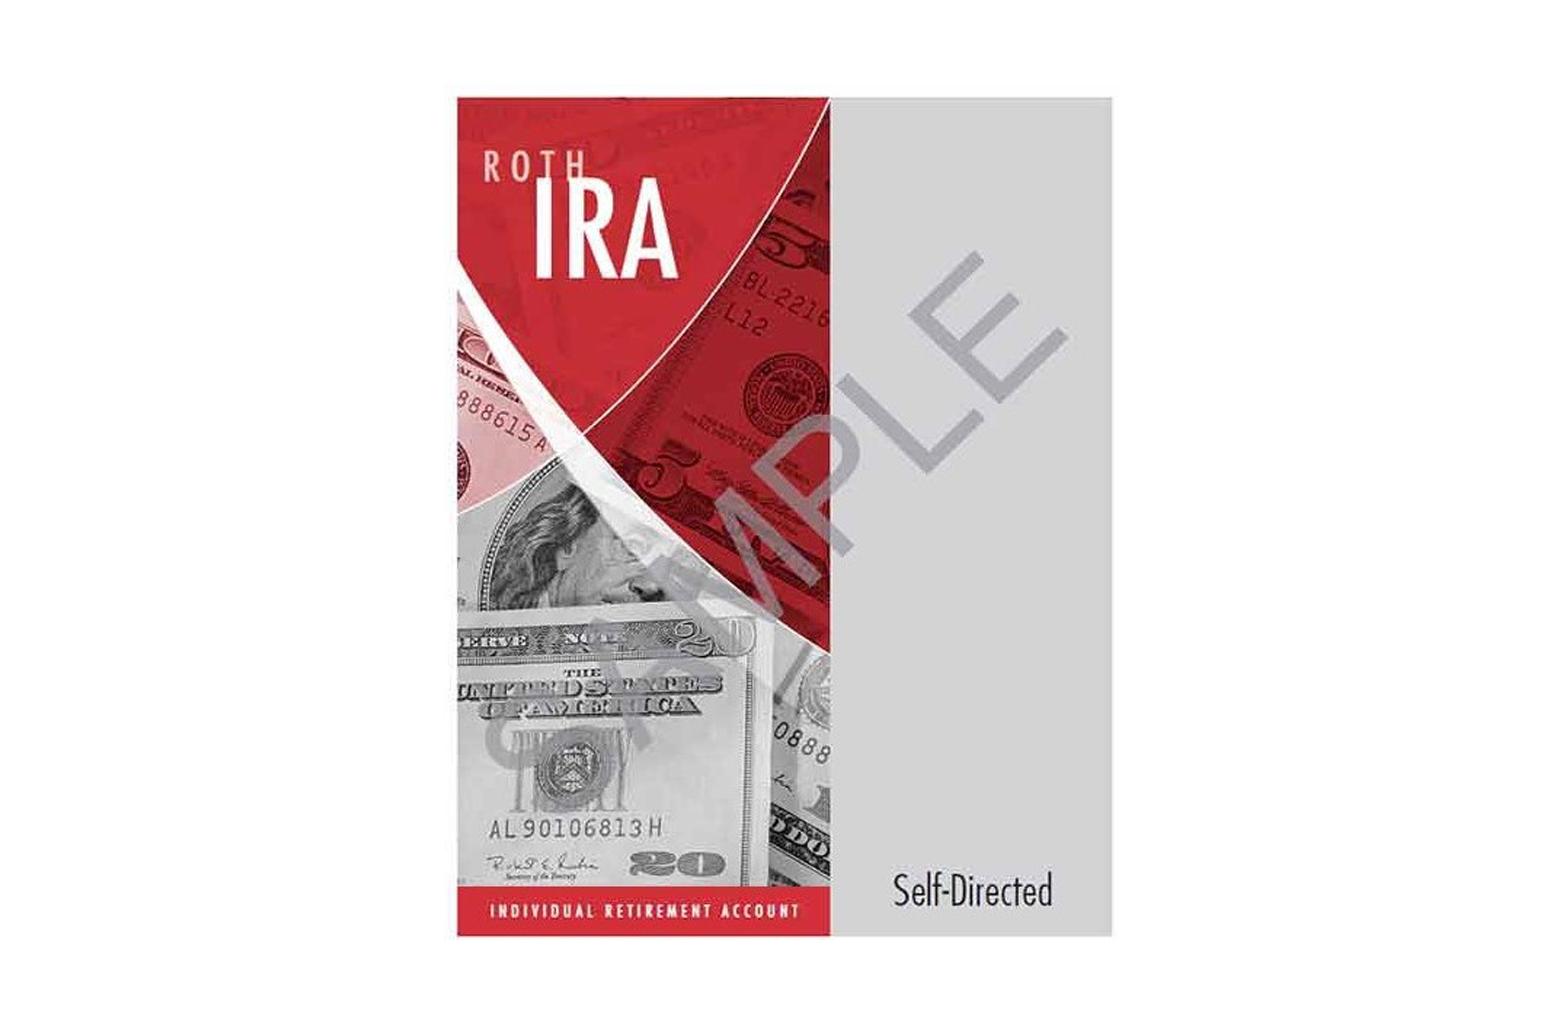 Roth IRA Organizer - Self-Directed sample